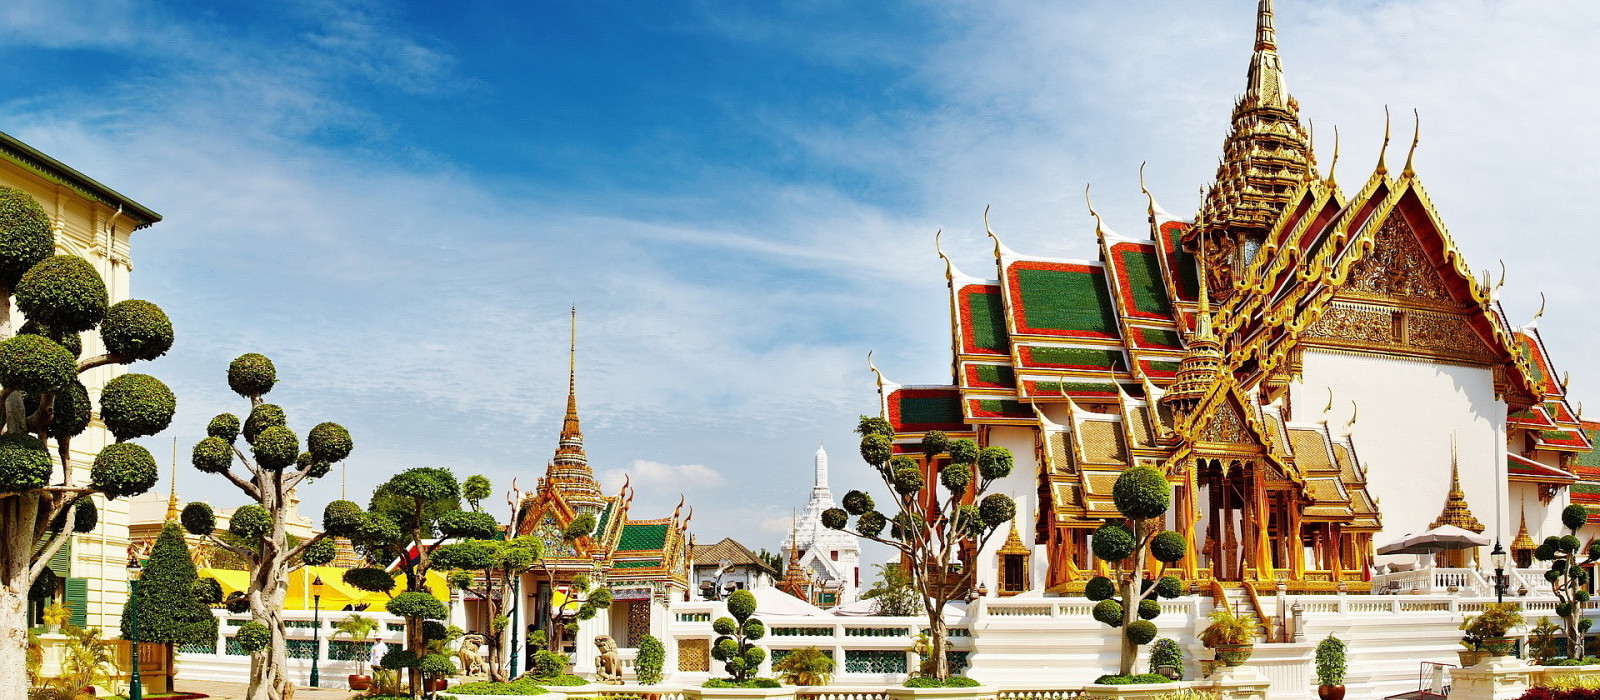 Urban Hotspots of Asia Tour Trip 1